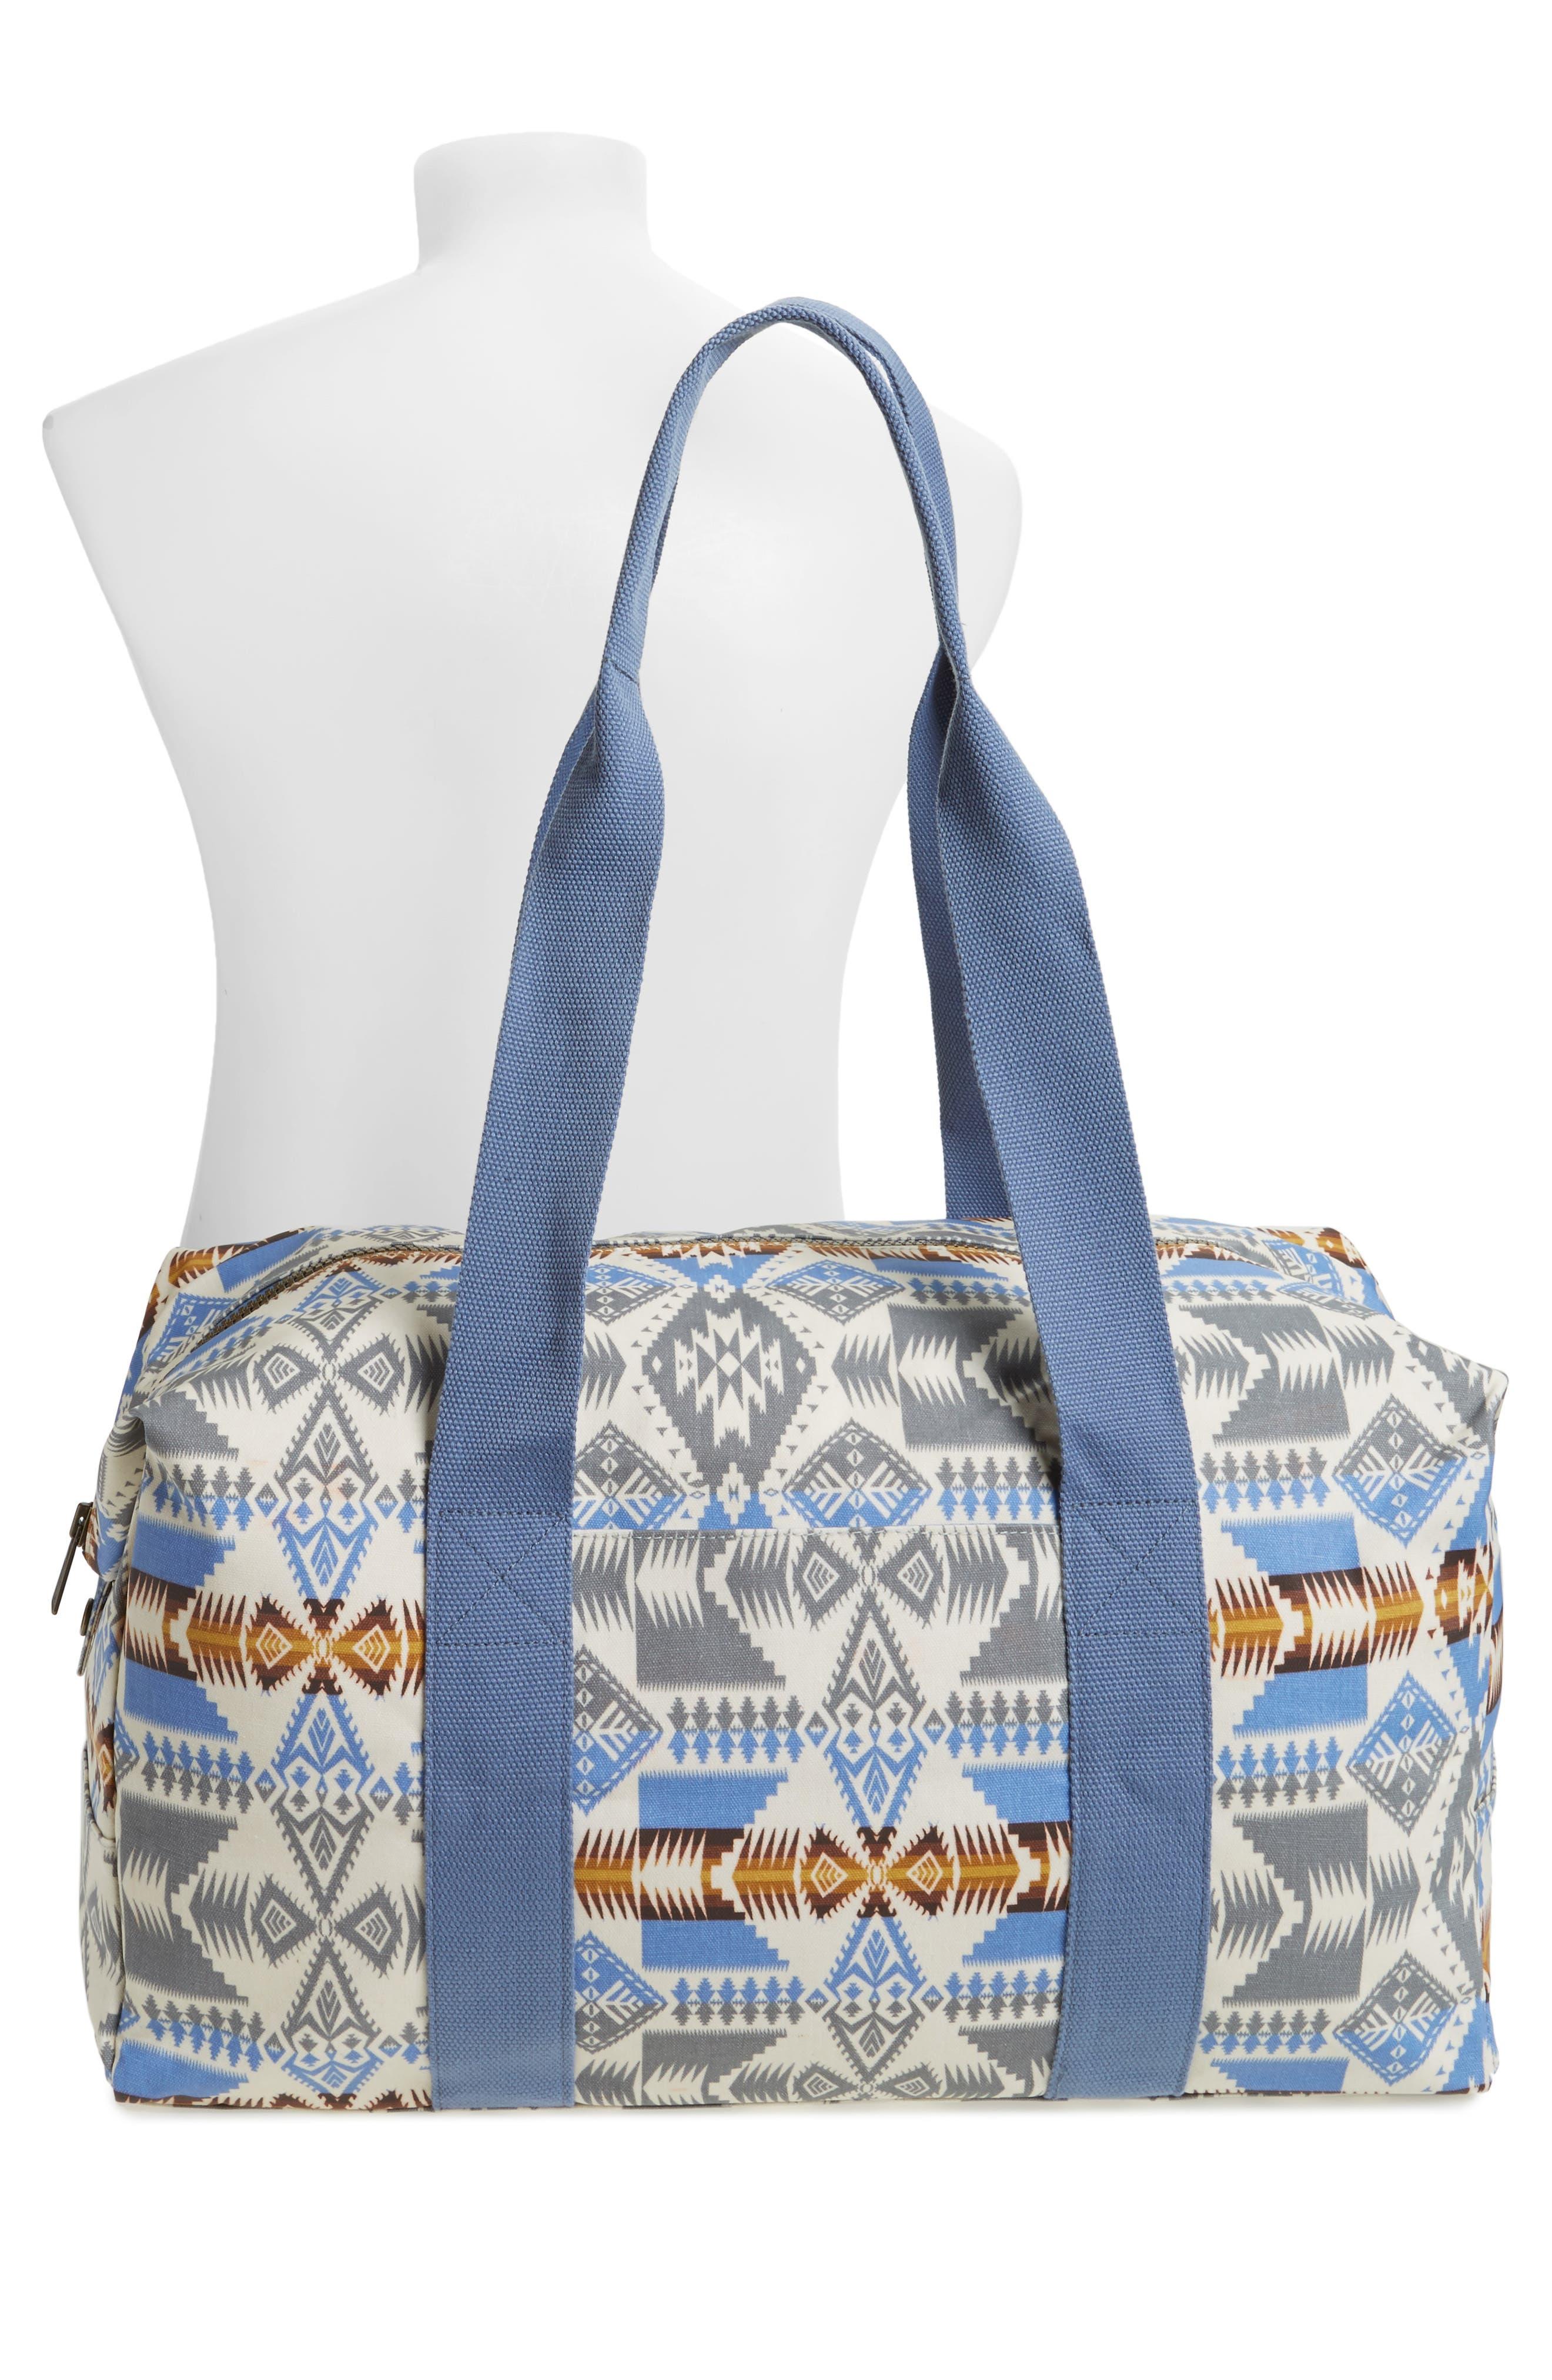 Canopy Duffel Bag,                             Alternate thumbnail 2, color,                             040